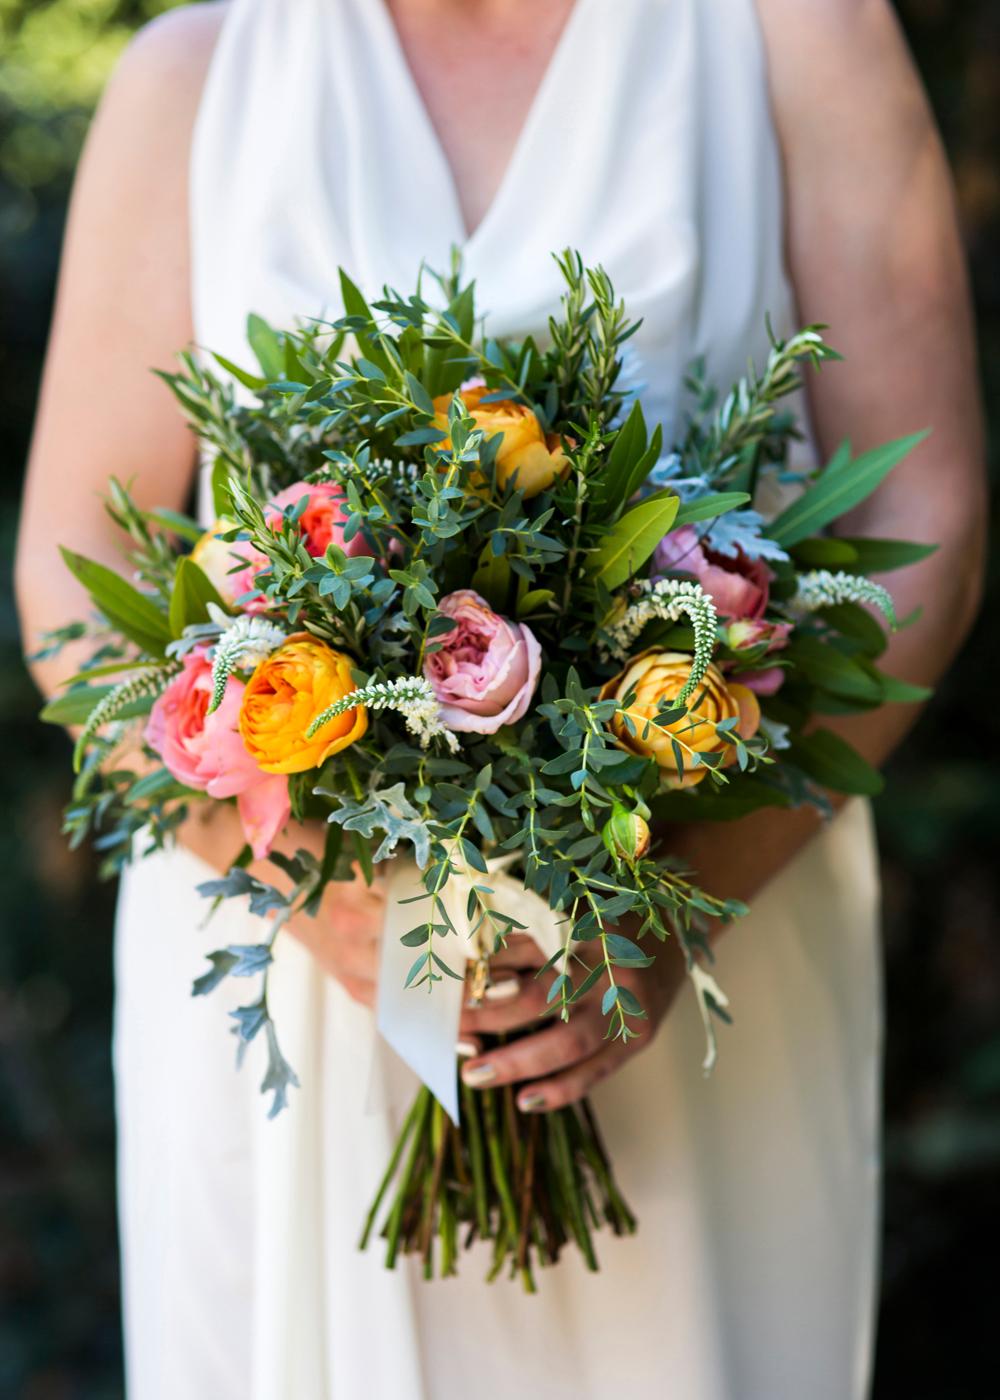 pema-osel-ling-santa-cruz-wedding-photography-lilouette-24.jpg